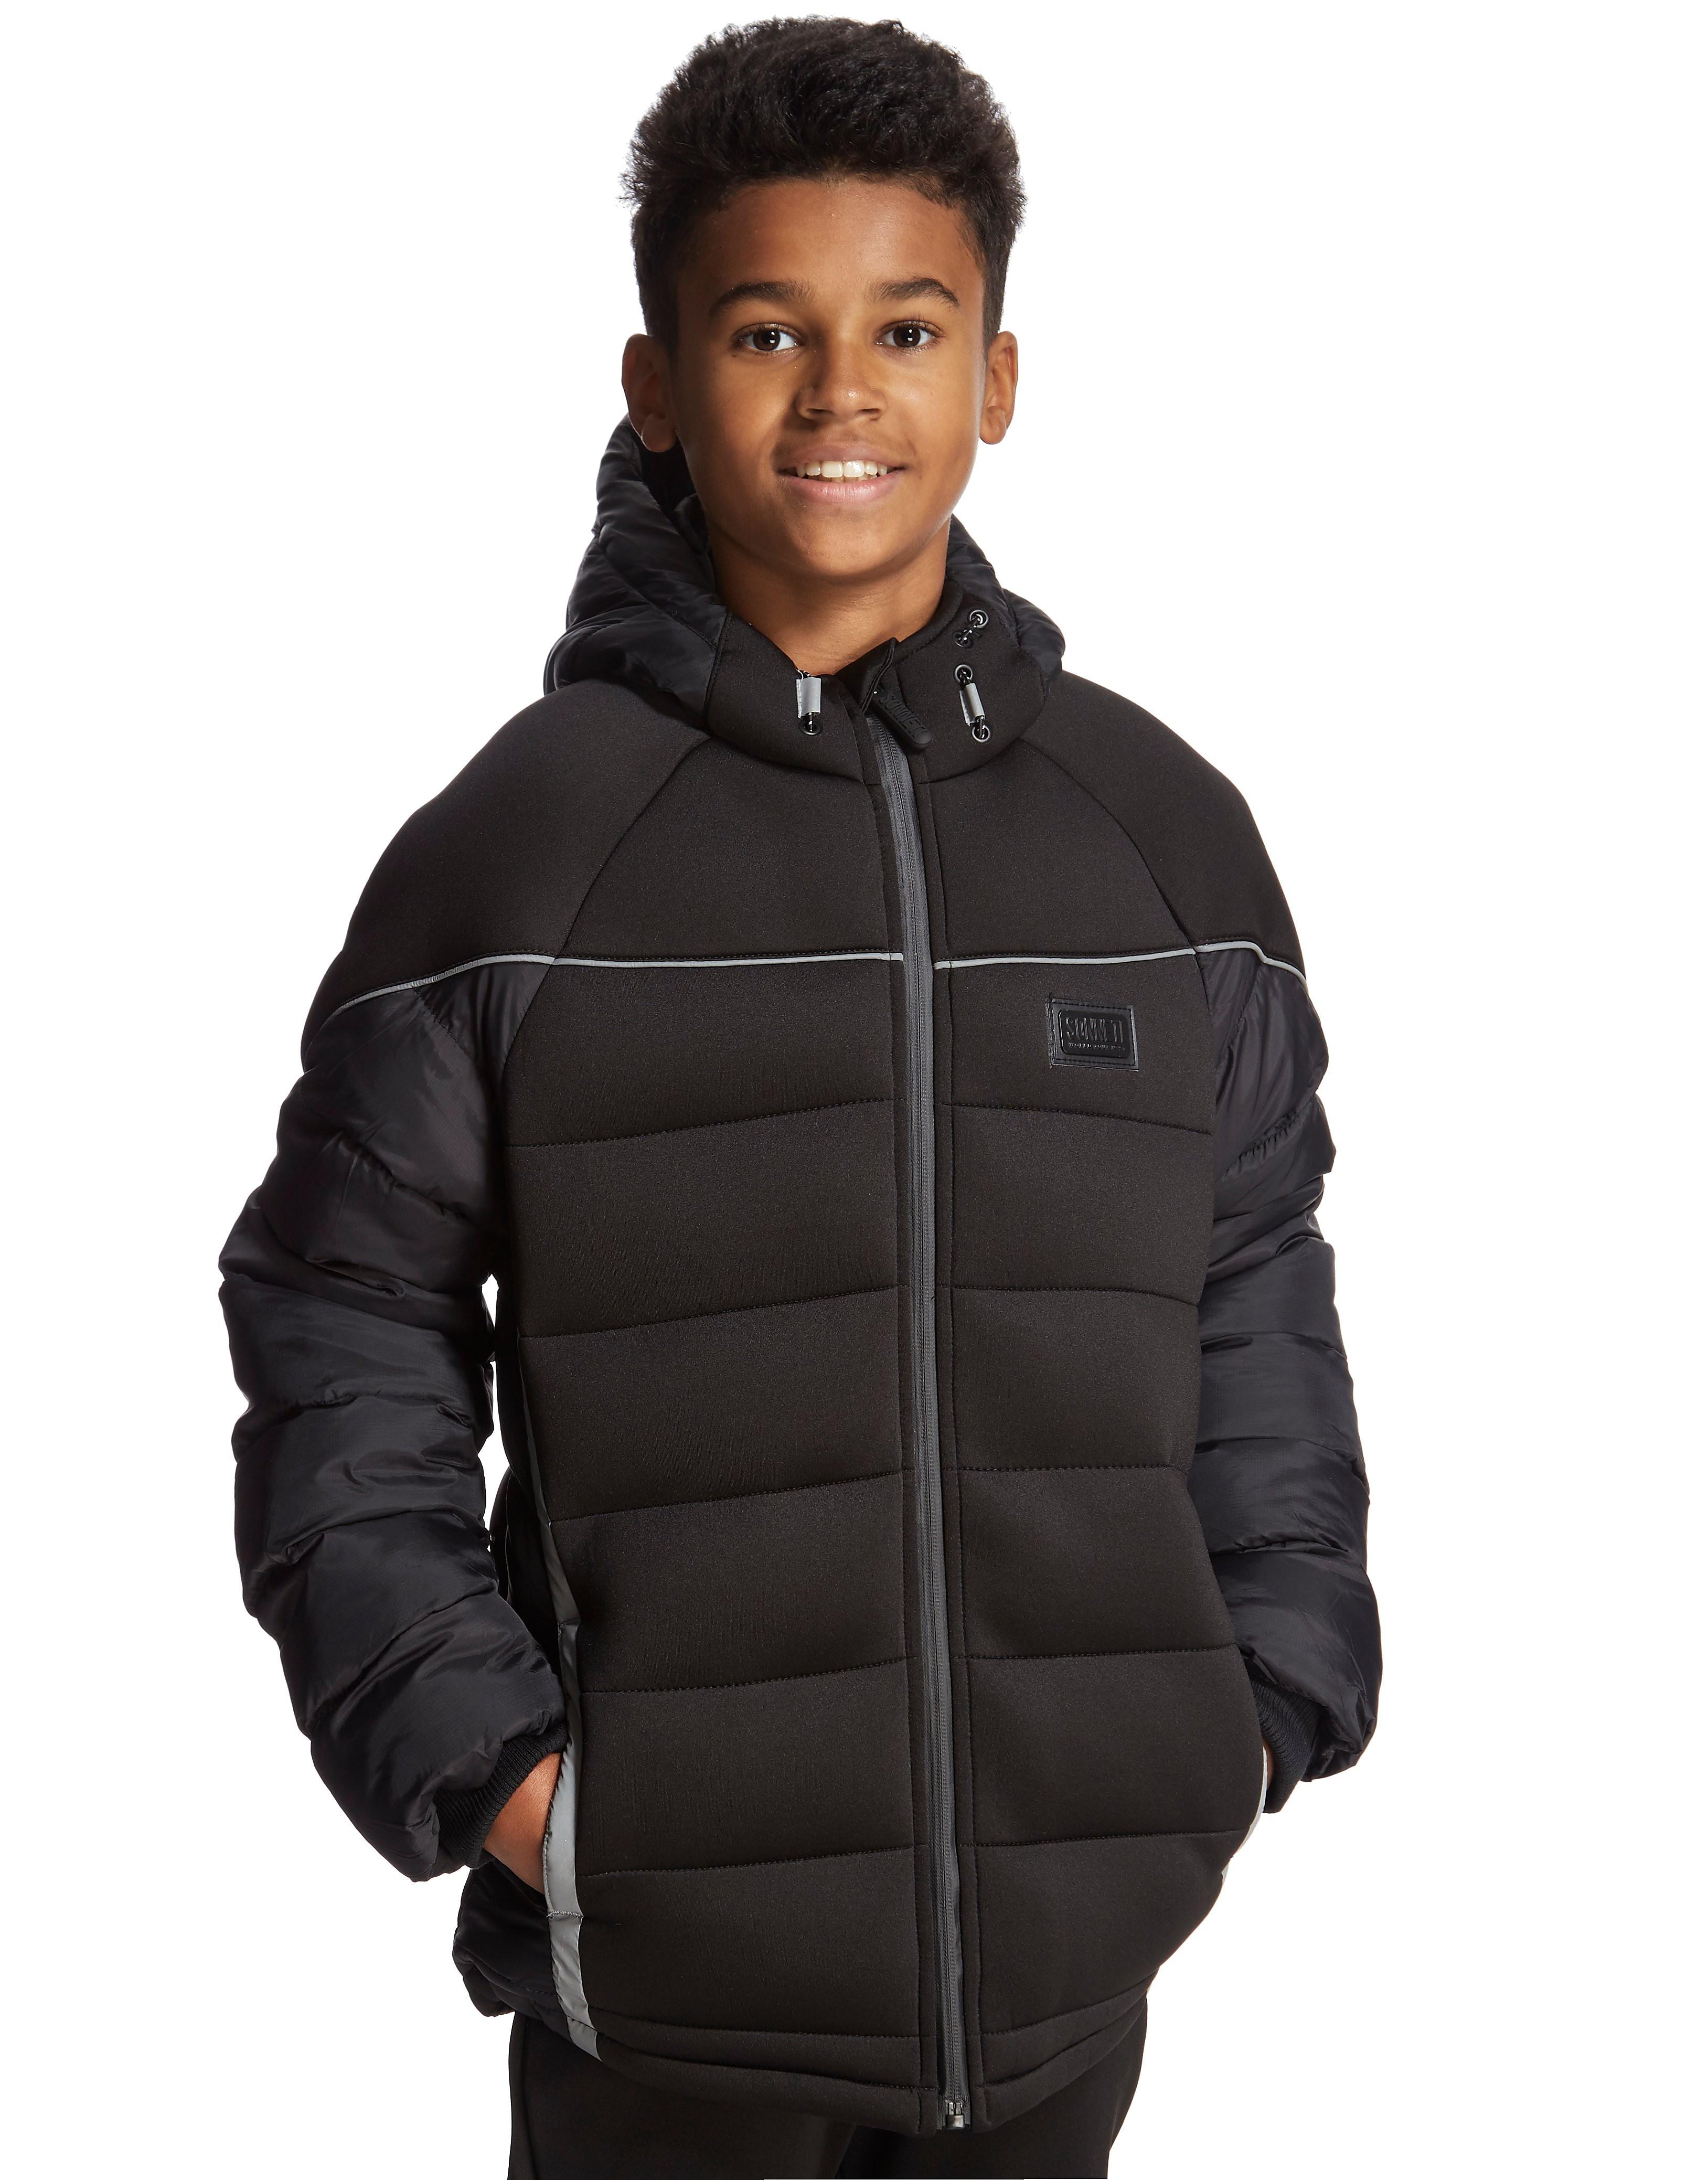 Sonneti Backtrack Jacket Junior